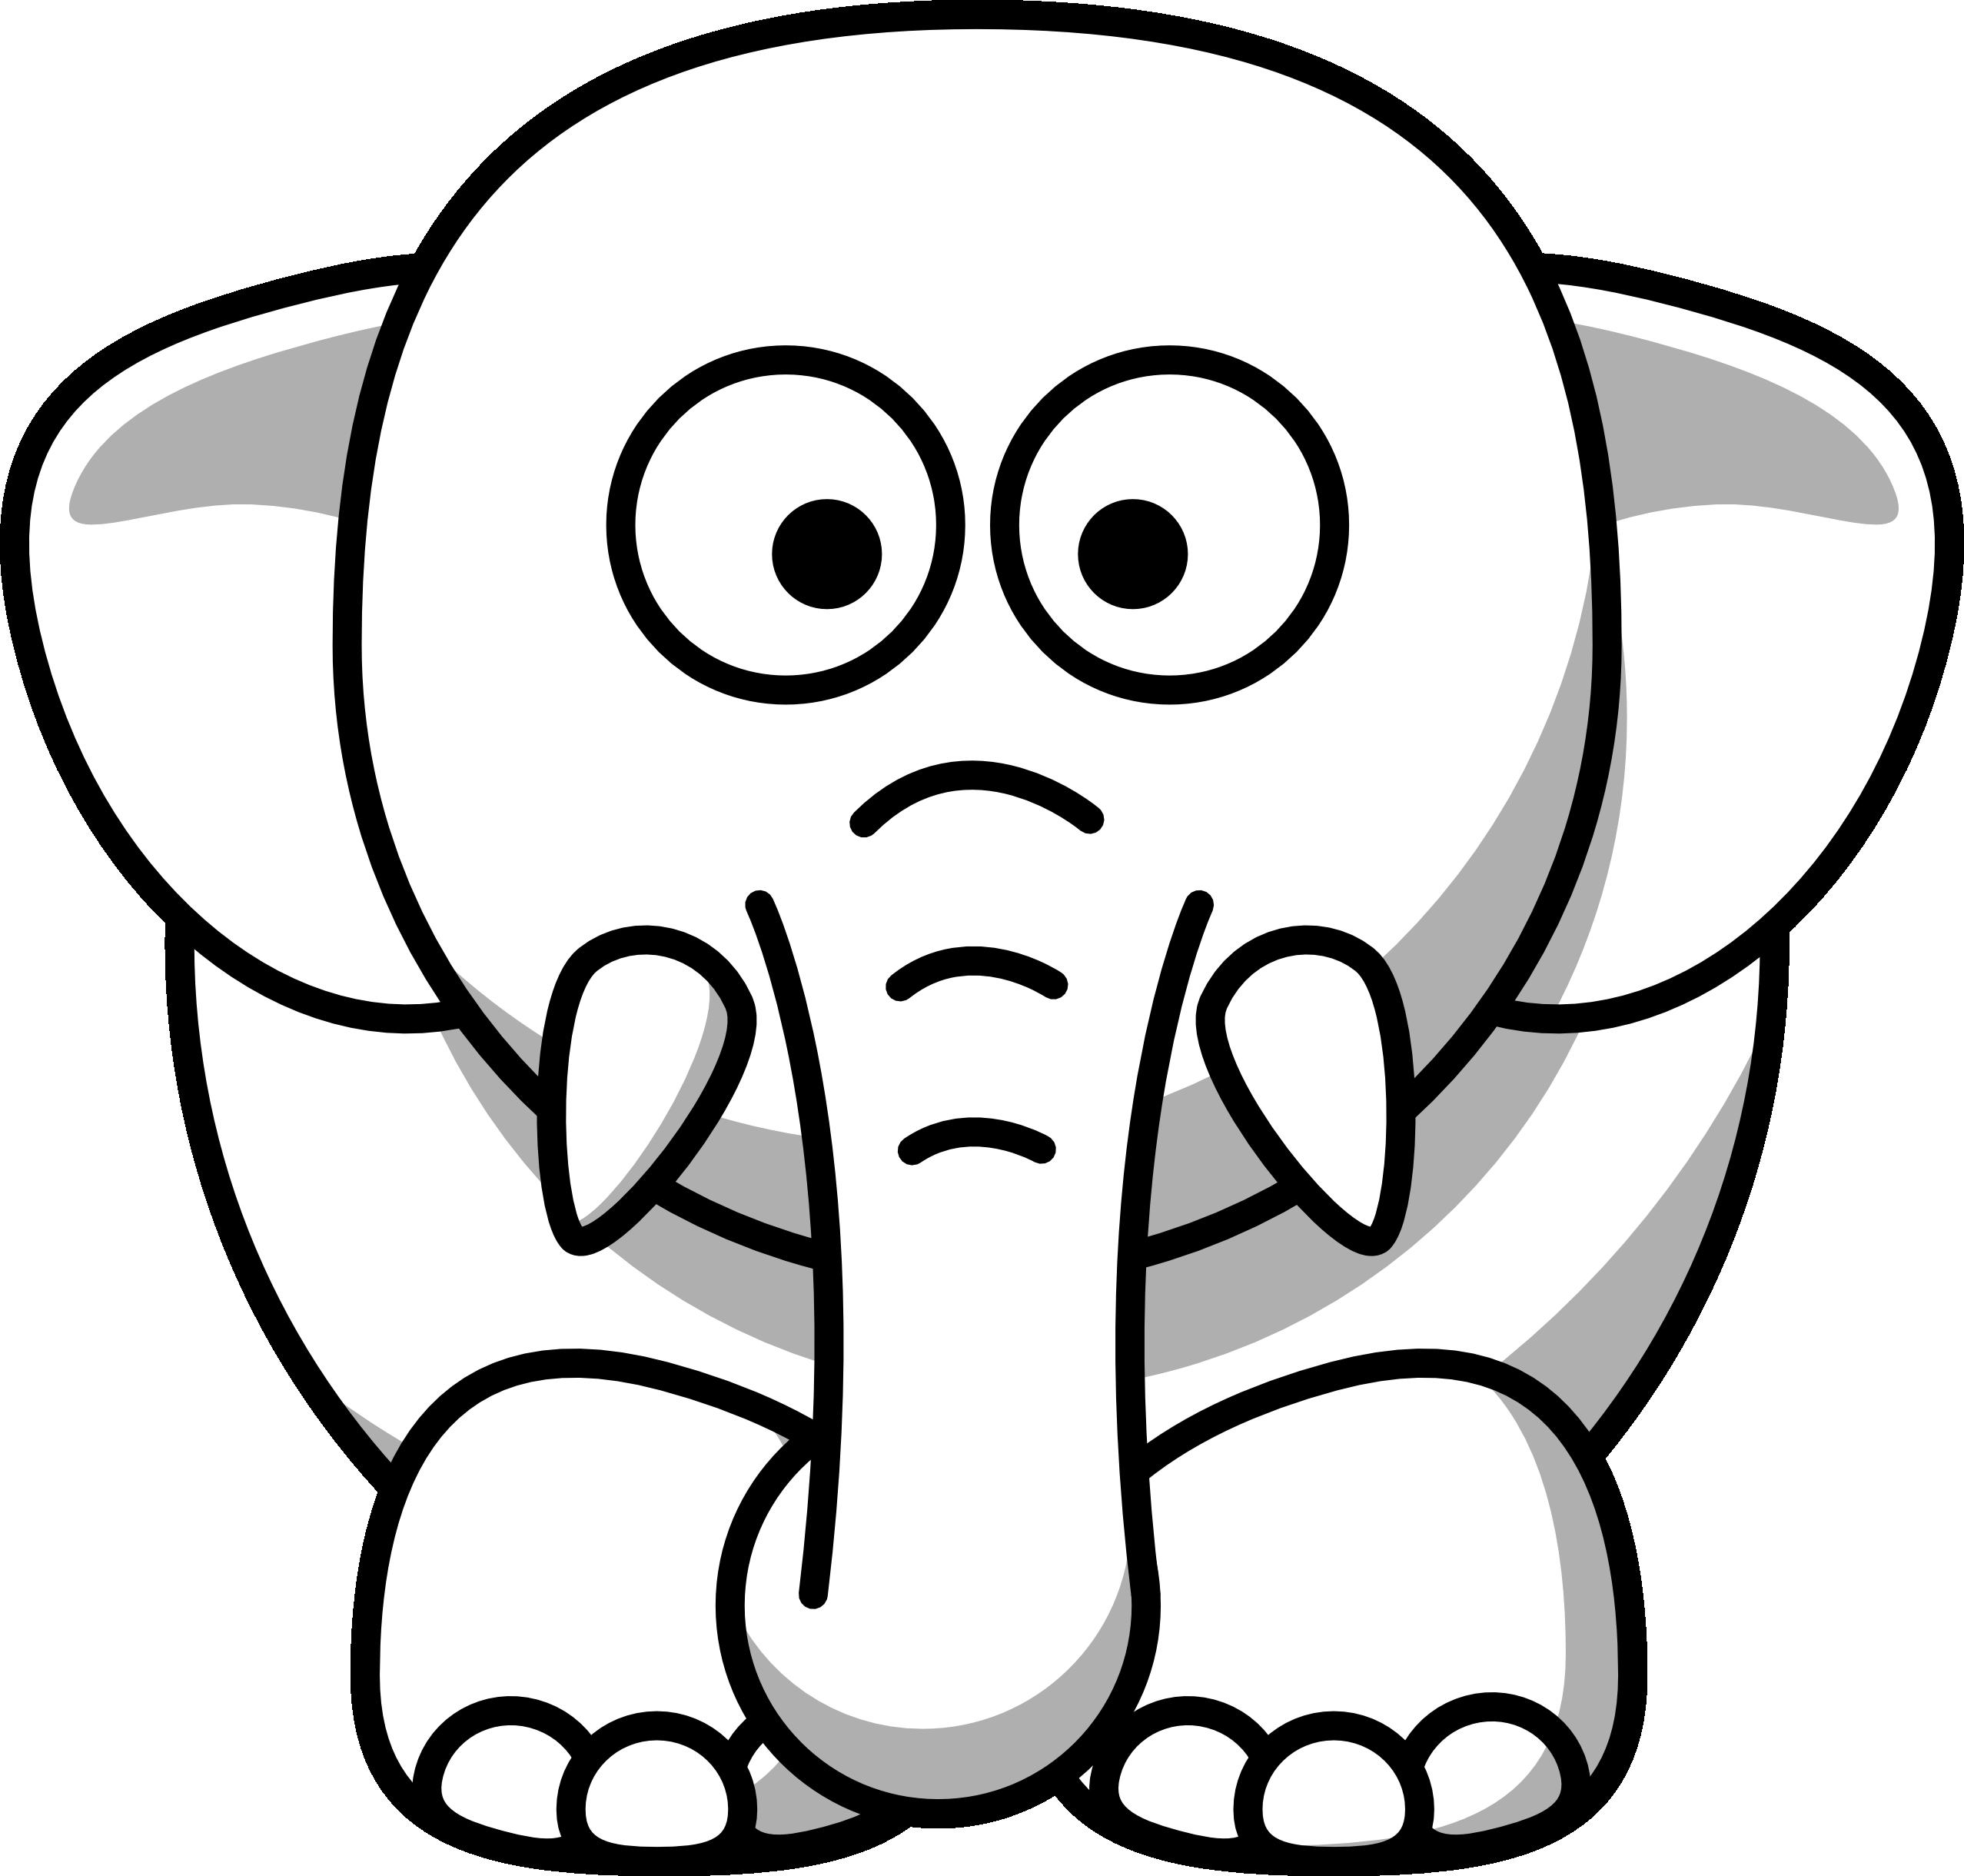 Net Clipart Black And White Elephant Cop-Net Clipart Black And White Elephant Copy Black White Line Art-17